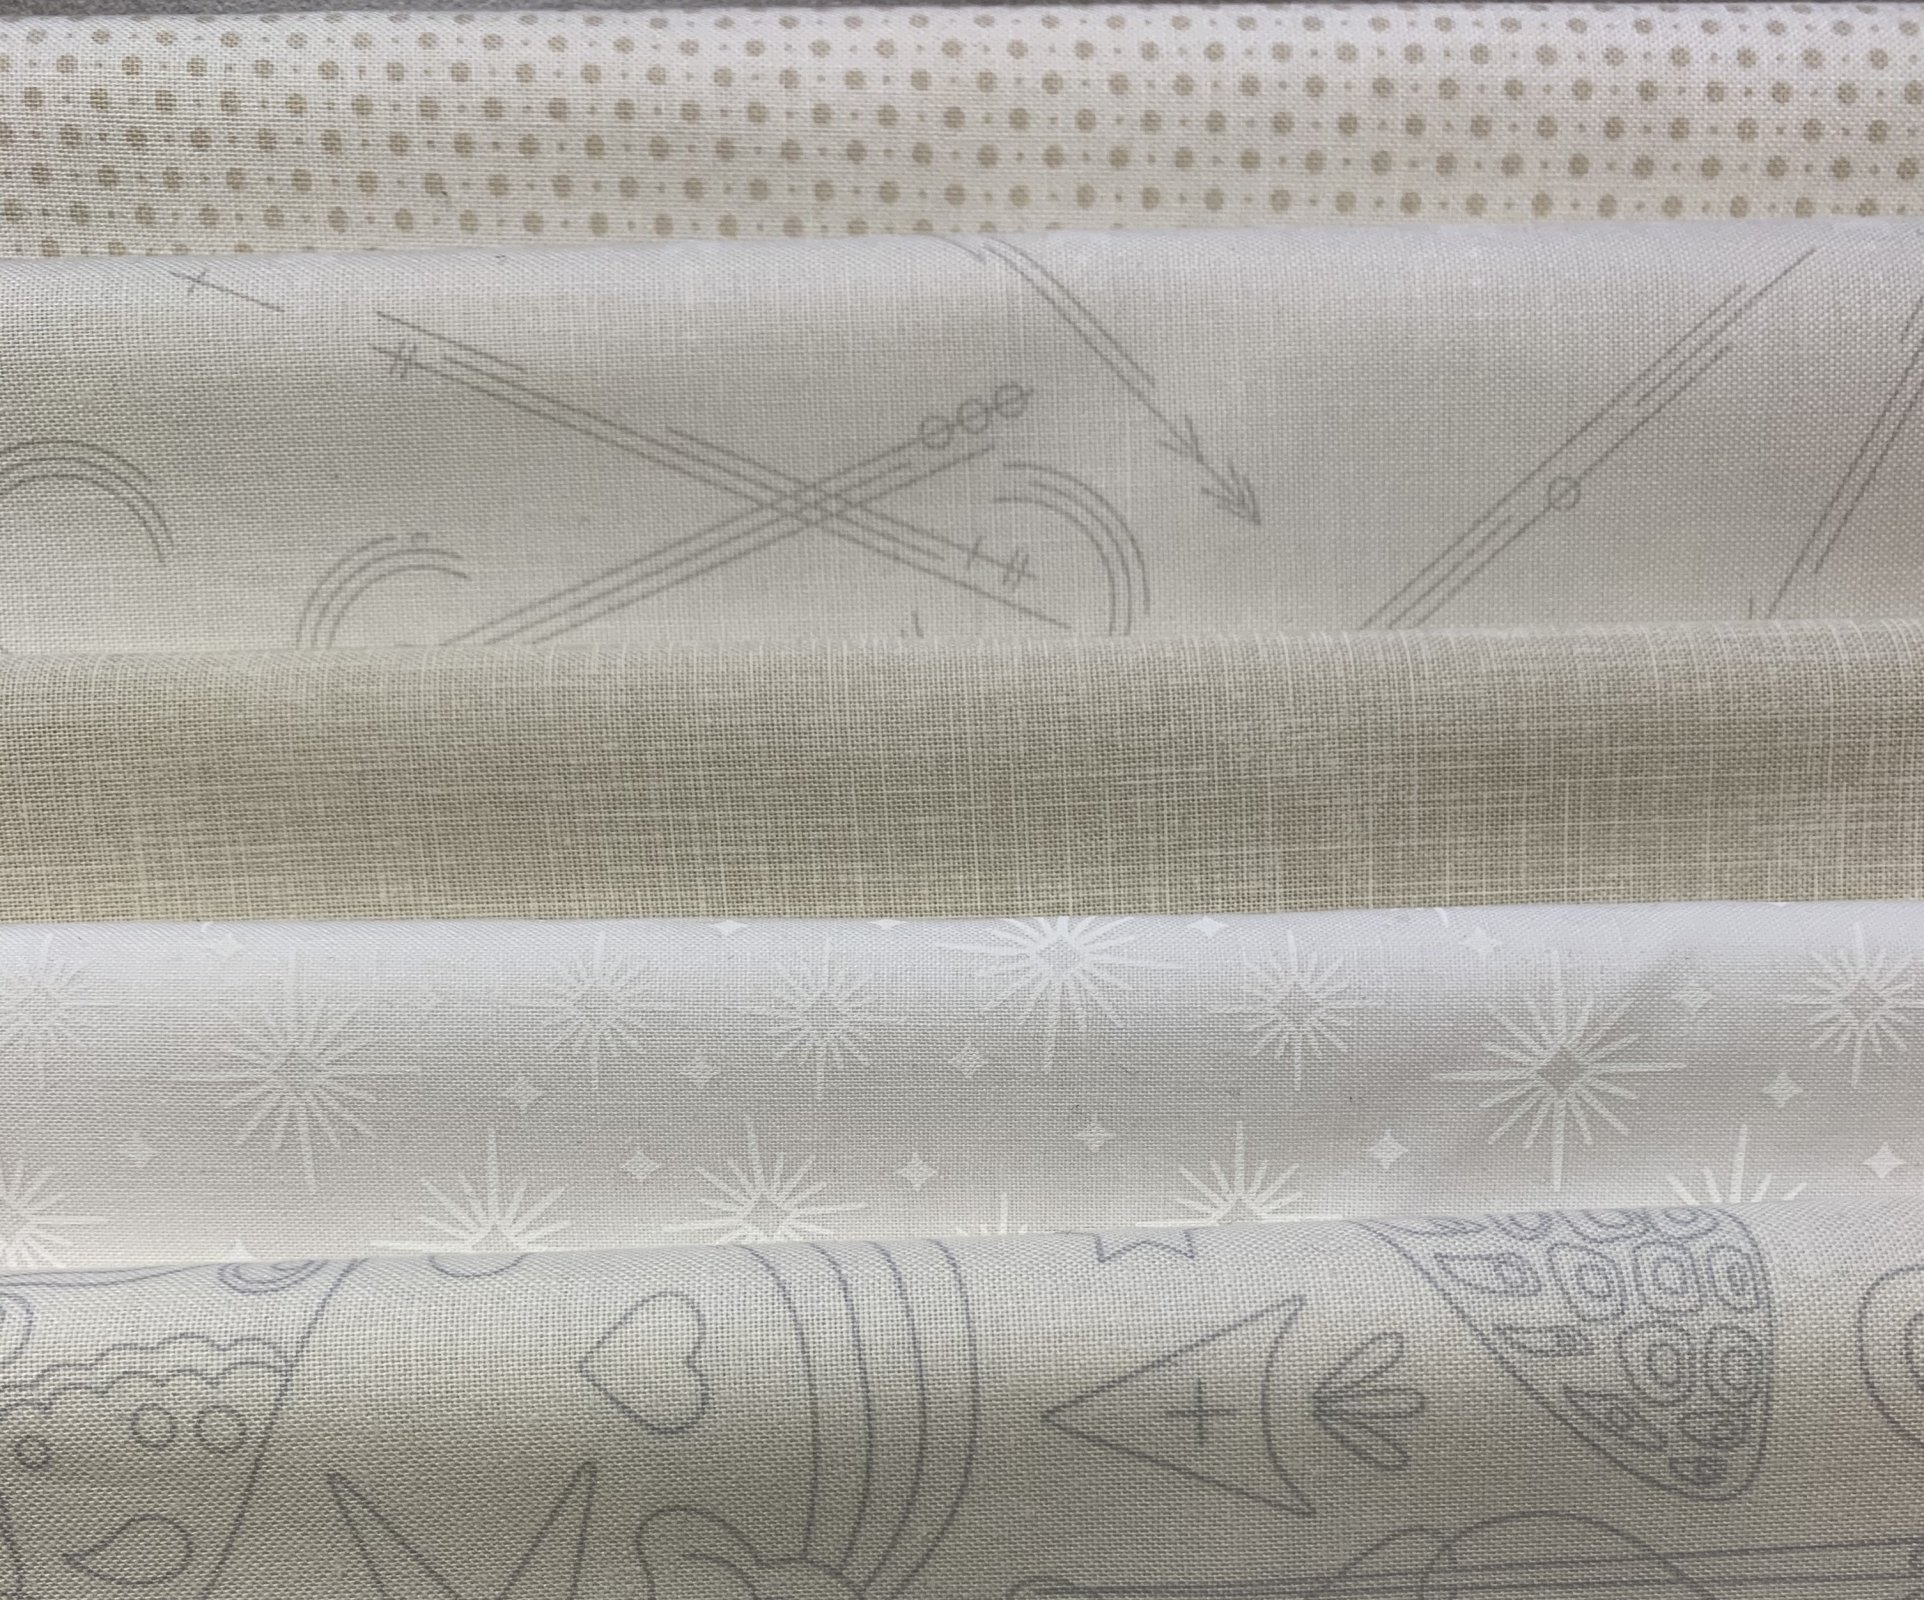 Scrappy Light half yard bundle of 5 Fabrics